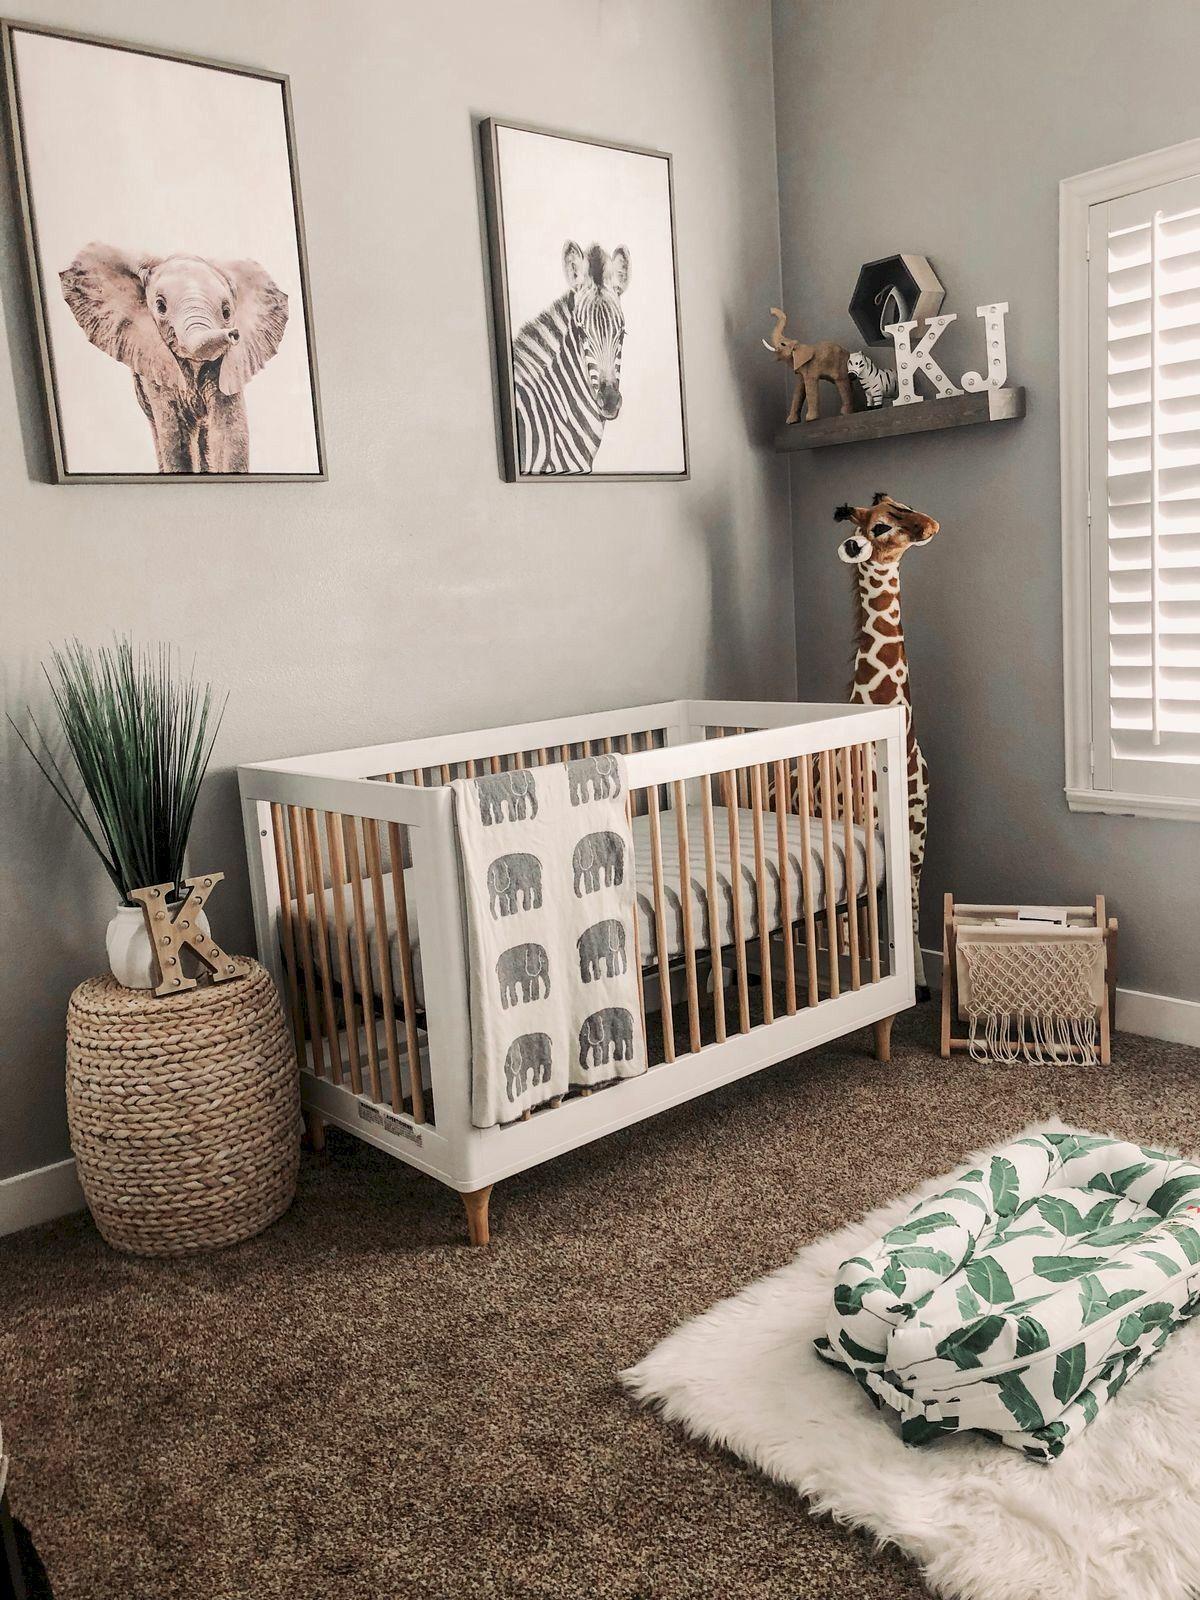 50 Cute Nursery Ideas For Baby Boy Babyboyblankets Your Baby Boy Deserves To Be Spoiled With A Mag Baby Boy Room Decor Nursery Baby Room Baby Boy Room Nursery